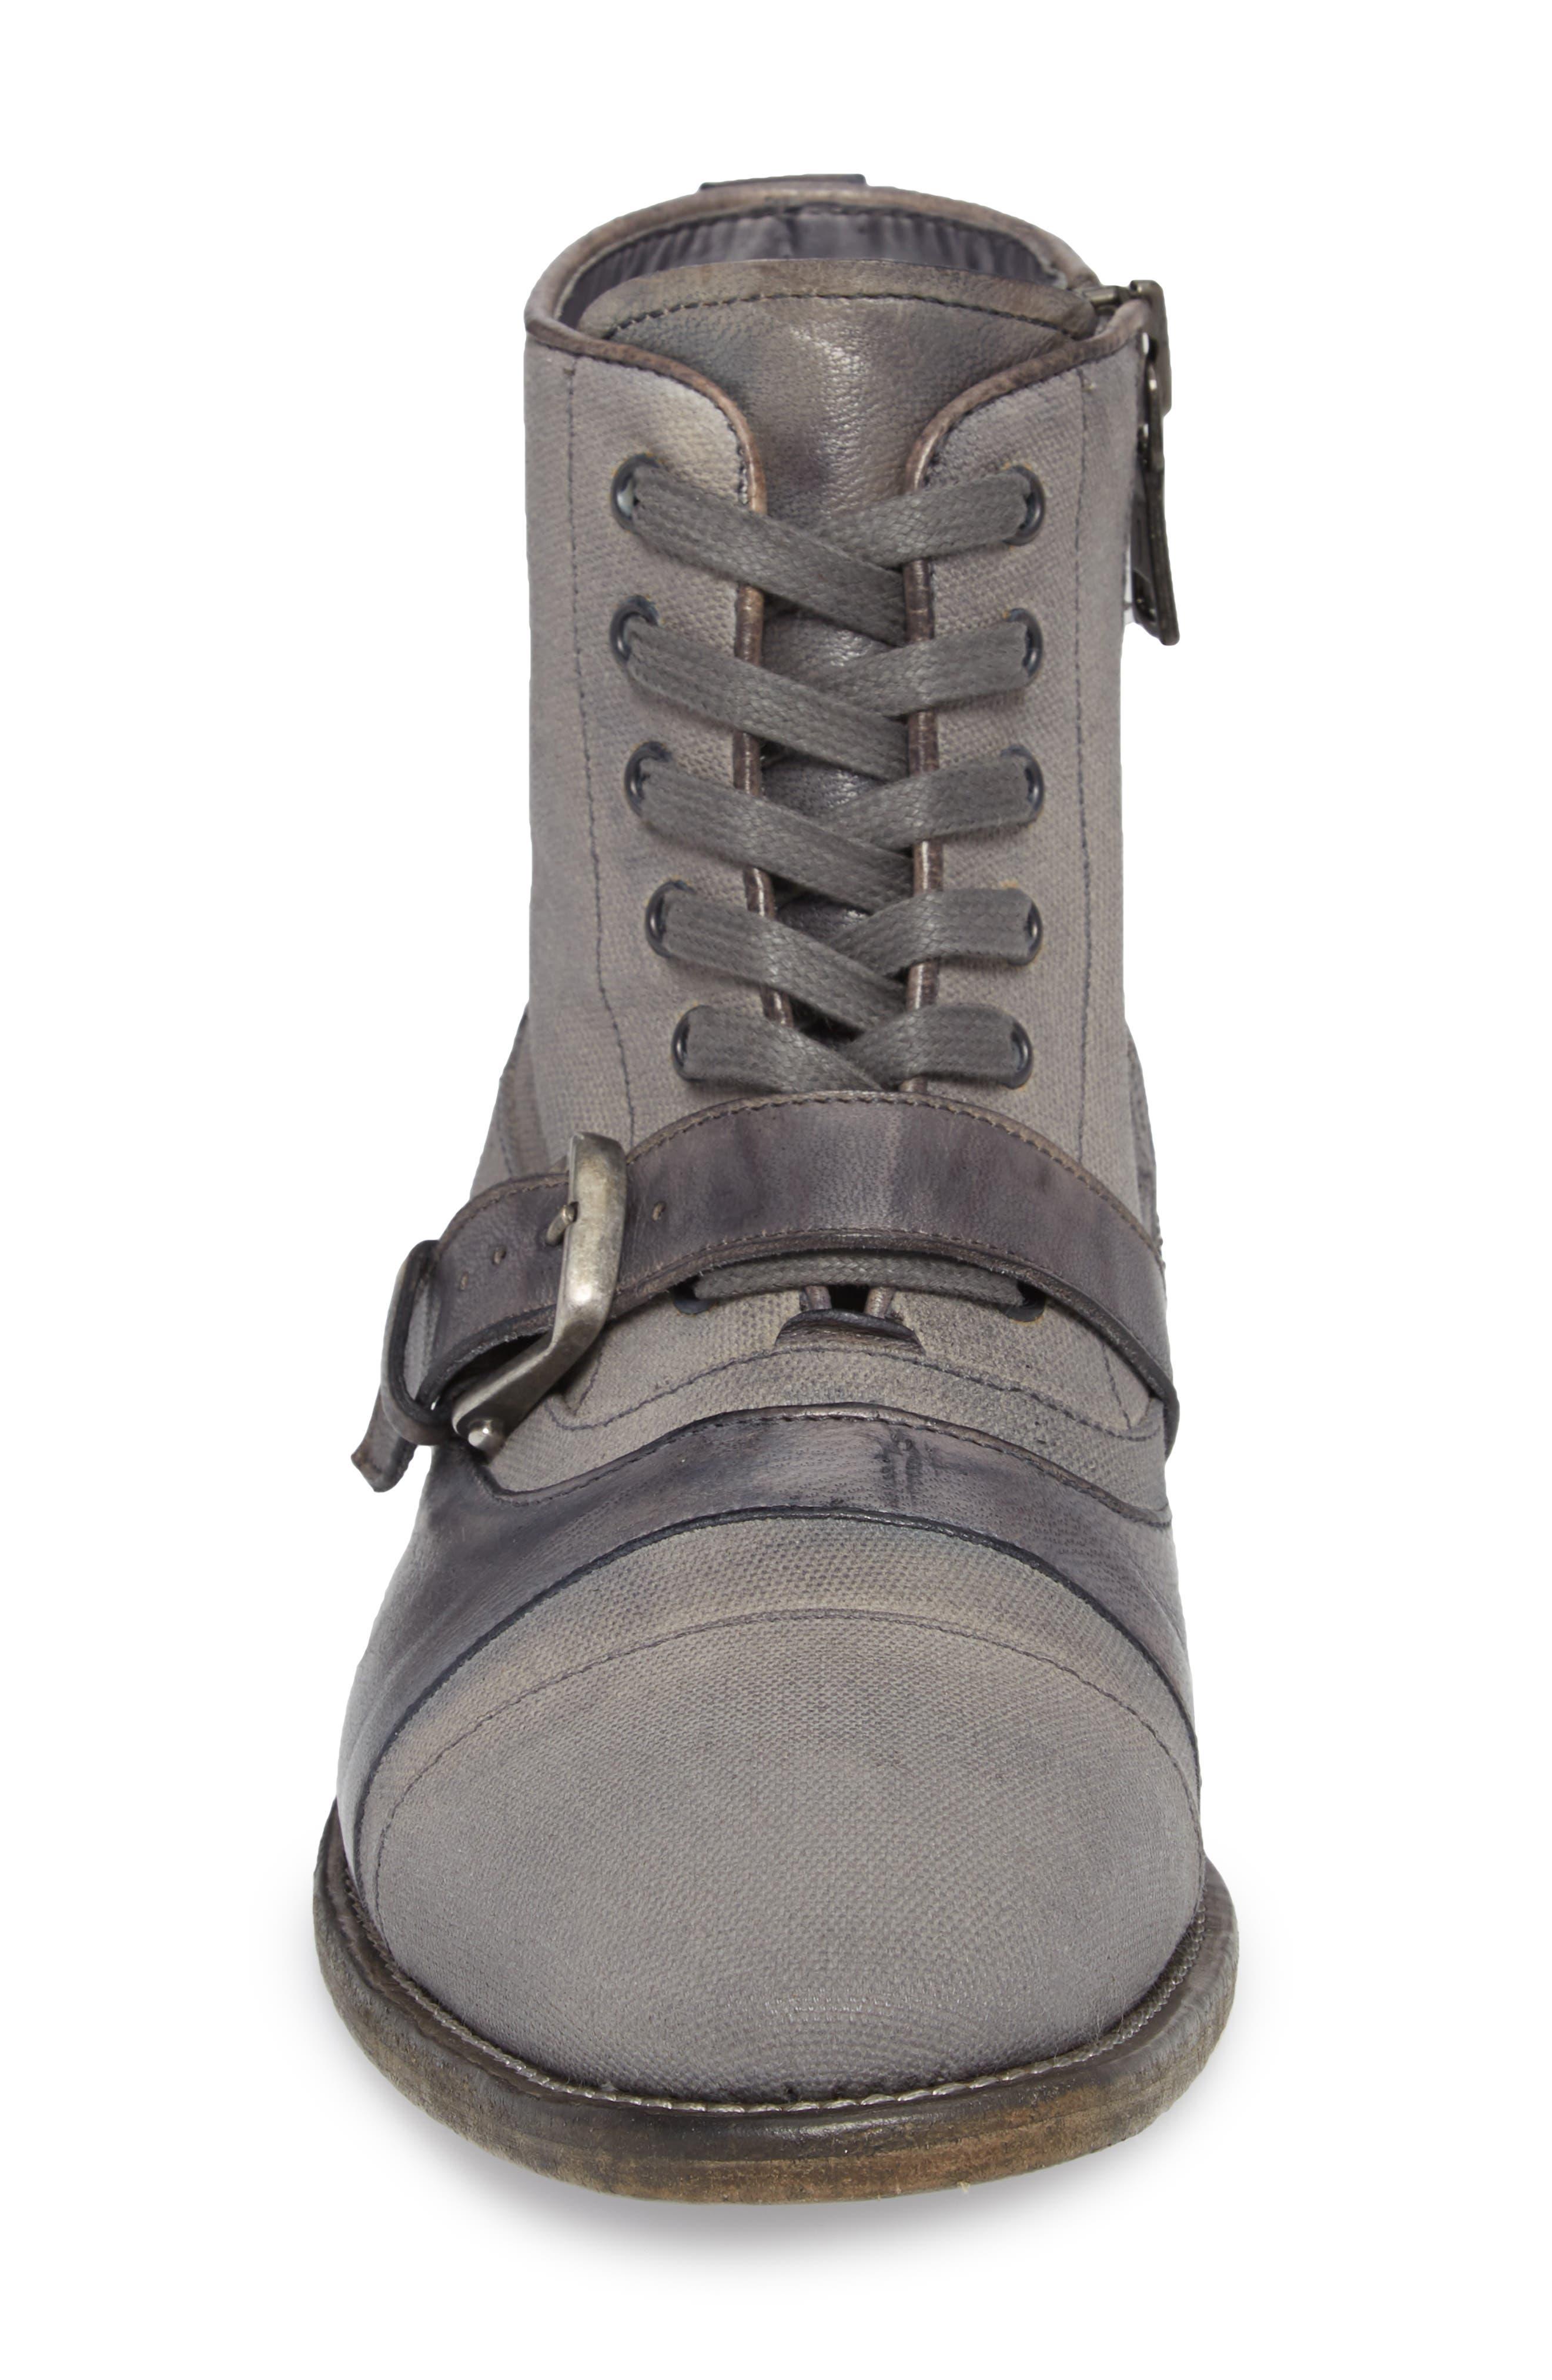 John Varvatos Fleetwood Buckle Cricket Boot,                             Alternate thumbnail 4, color,                             Lead Canvas/ Leather